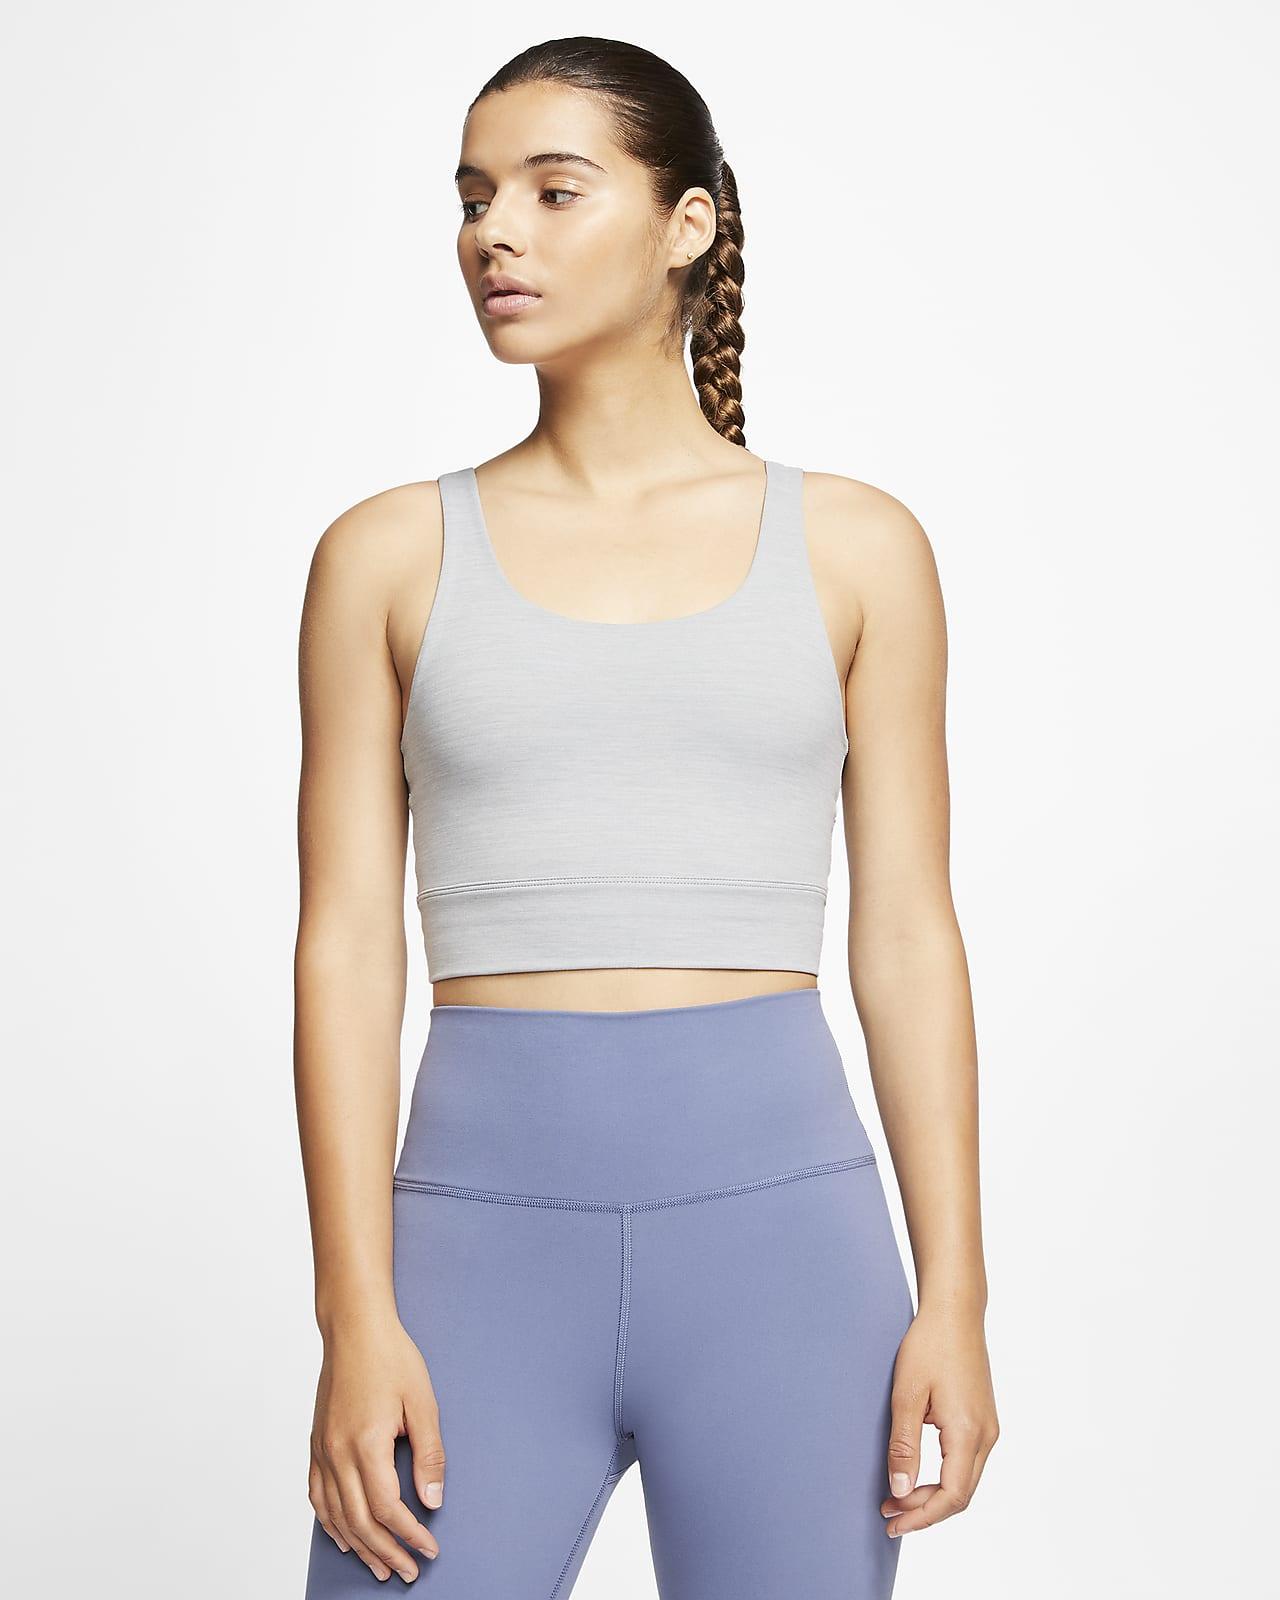 Crop top Infinalon Nike Yoga Luxe pour Femme